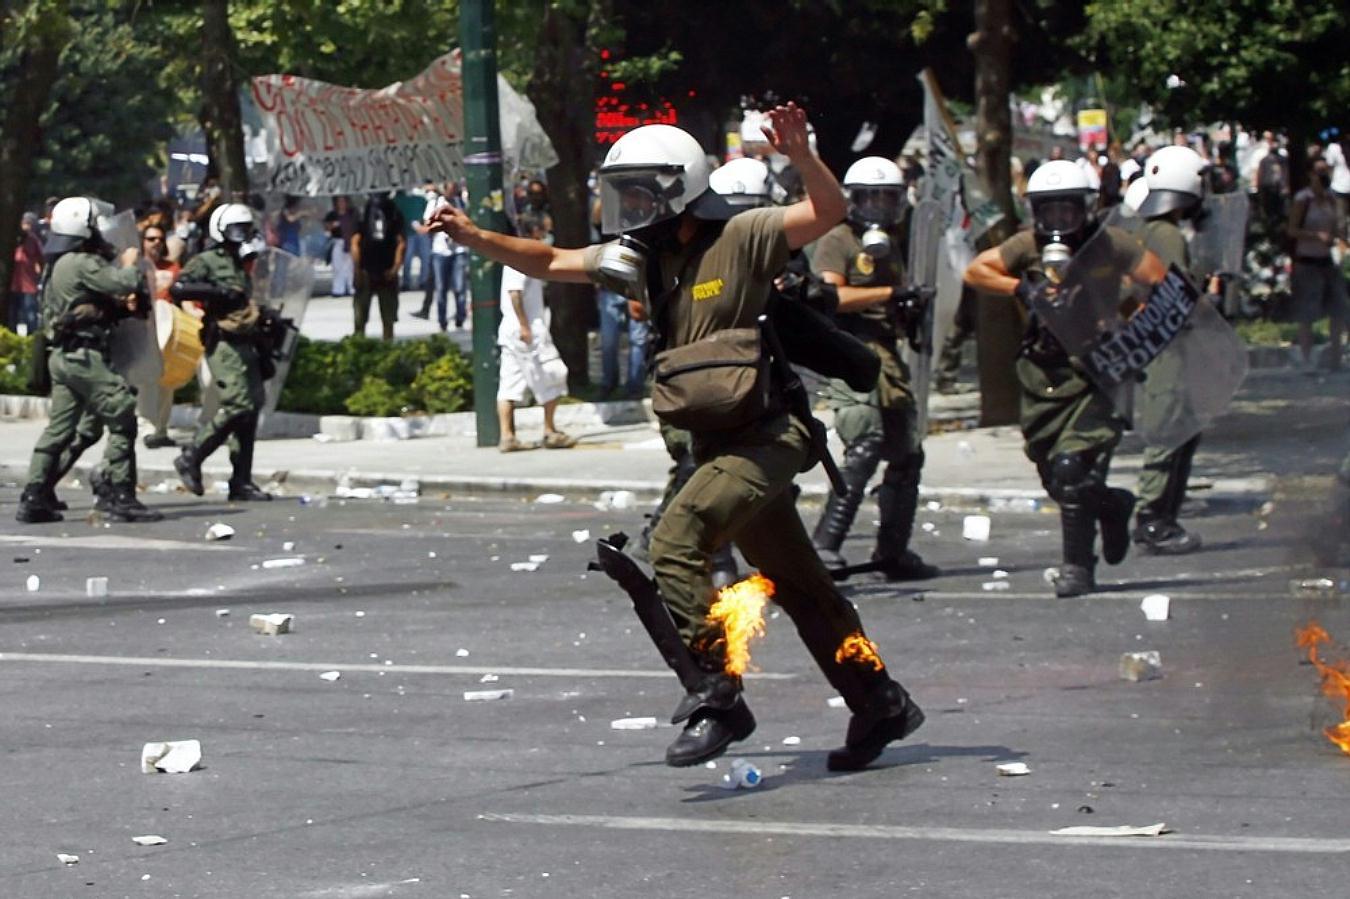 Jornadas de protesta Grecia 2011. Pict3